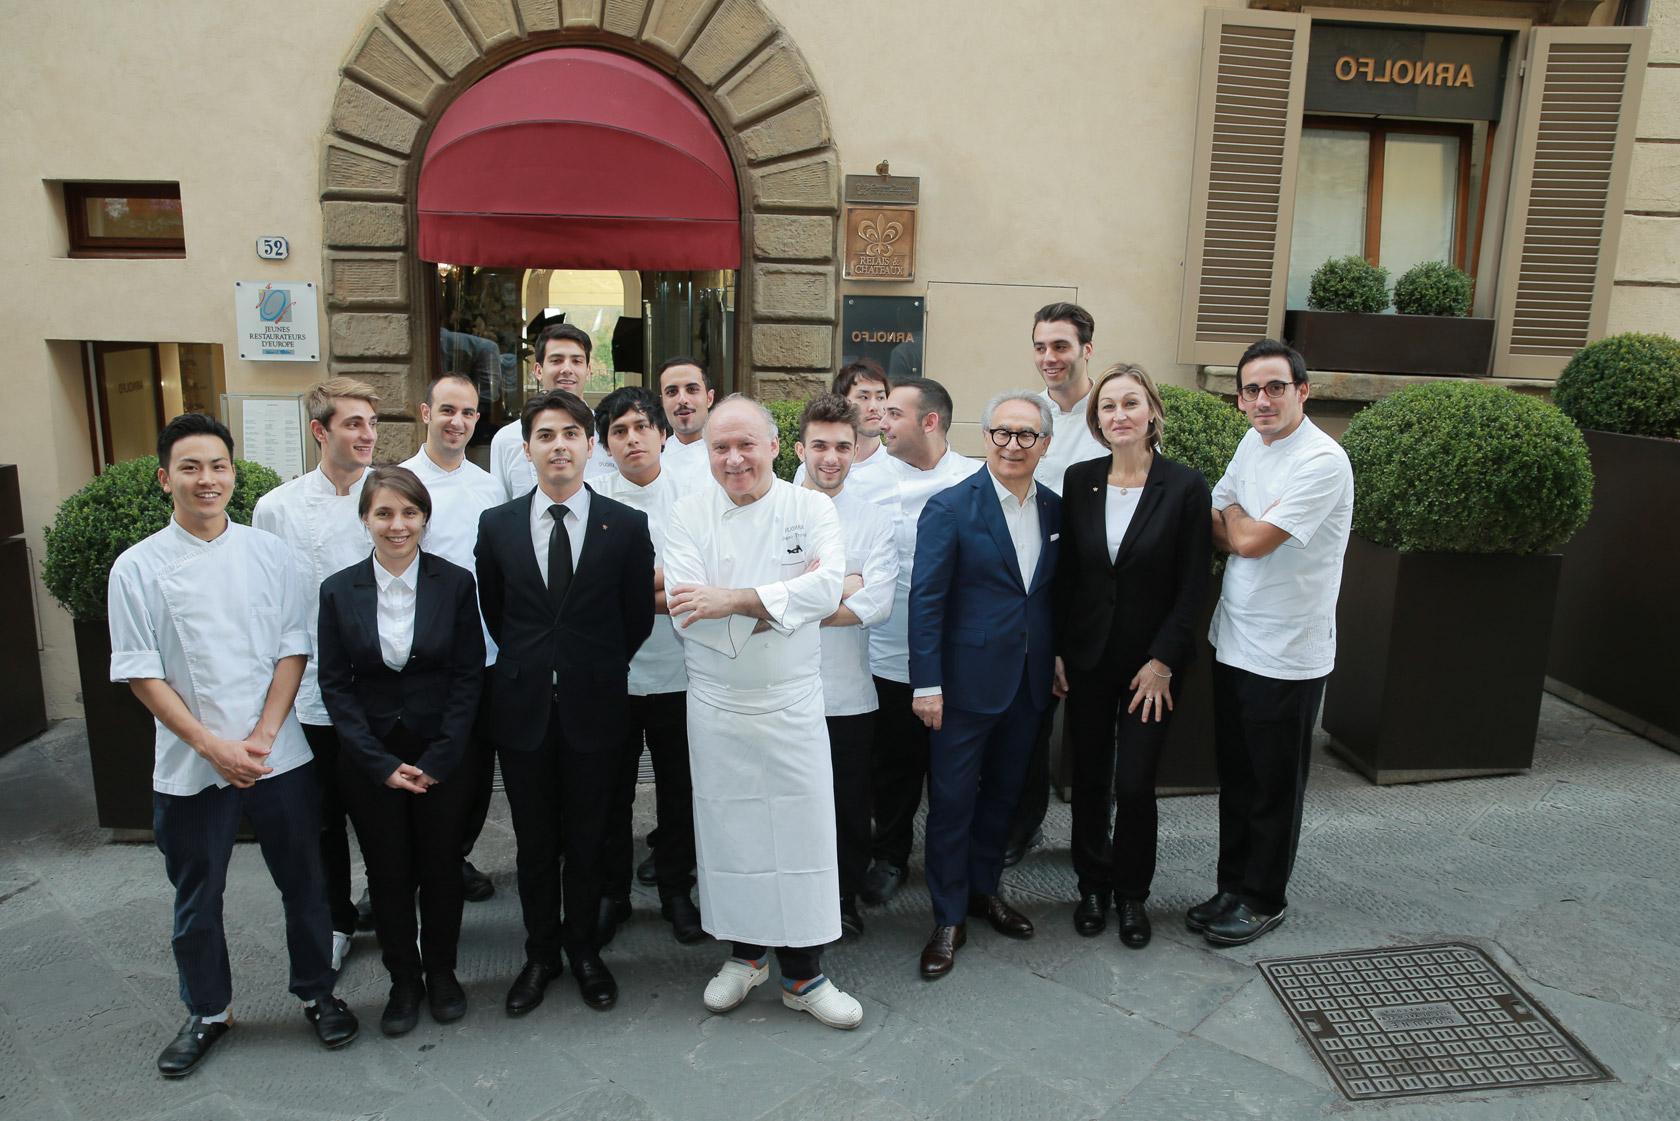 arnolfo_ristorante-2